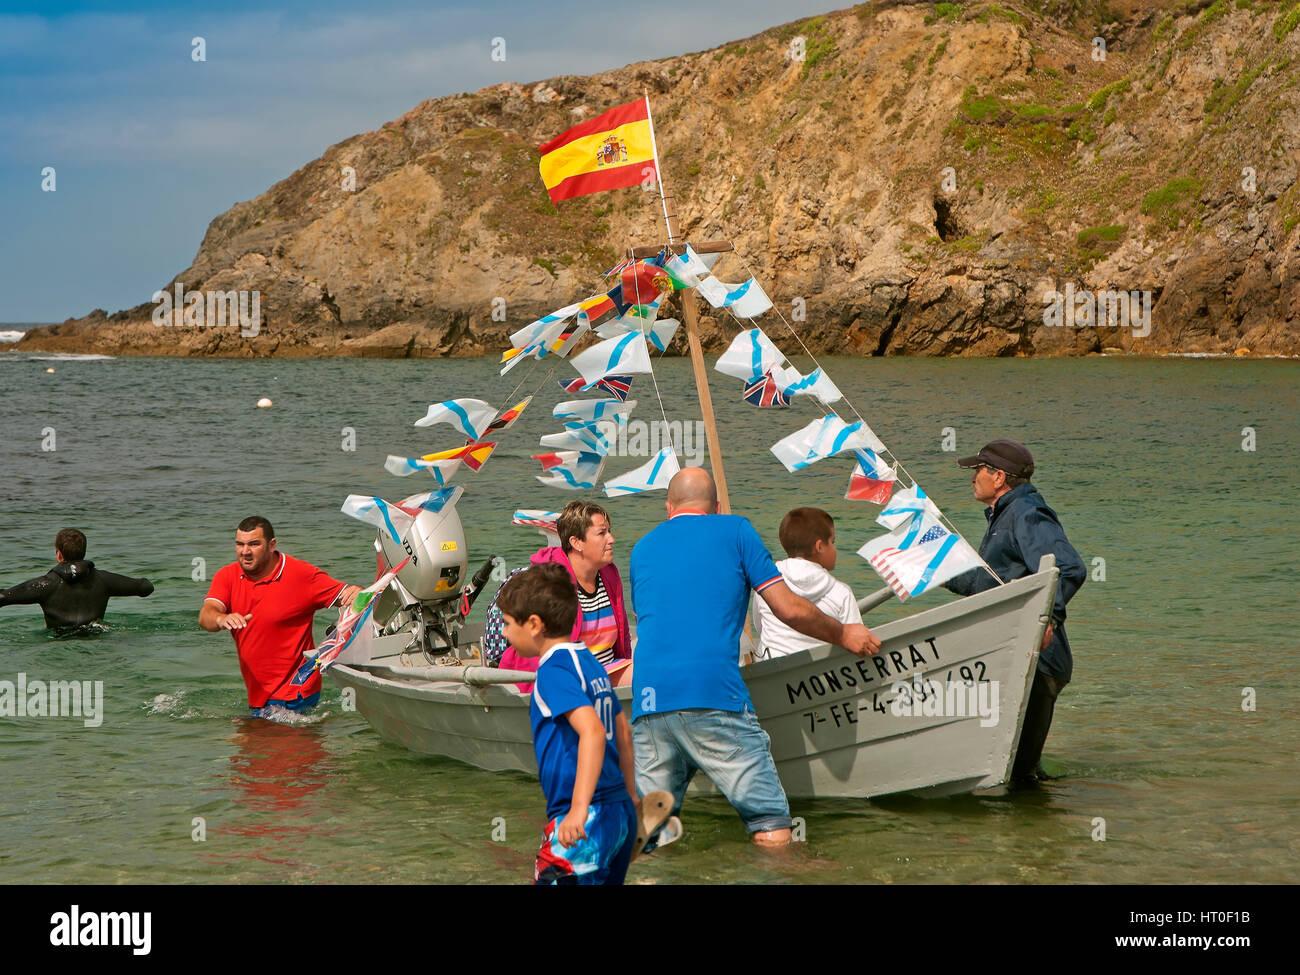 Fête de l'Virxe do Porto - personnes, Valdoviño Meiras - La Corogne, province, région de la Galice, Photo Stock